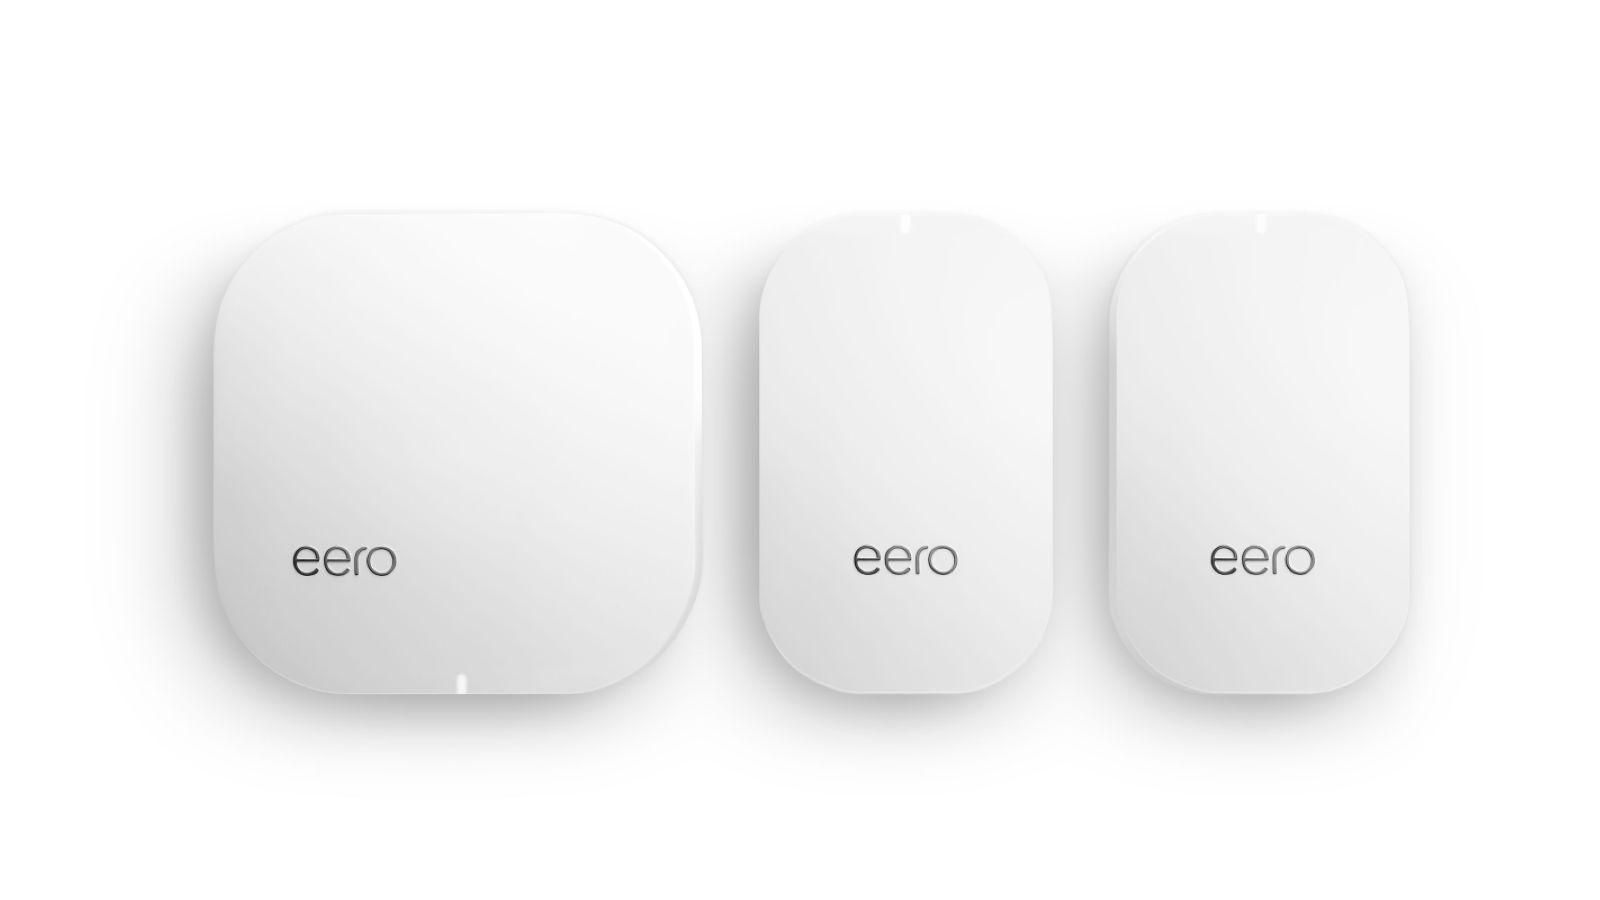 Amazon buys wi-fi router maker Eero